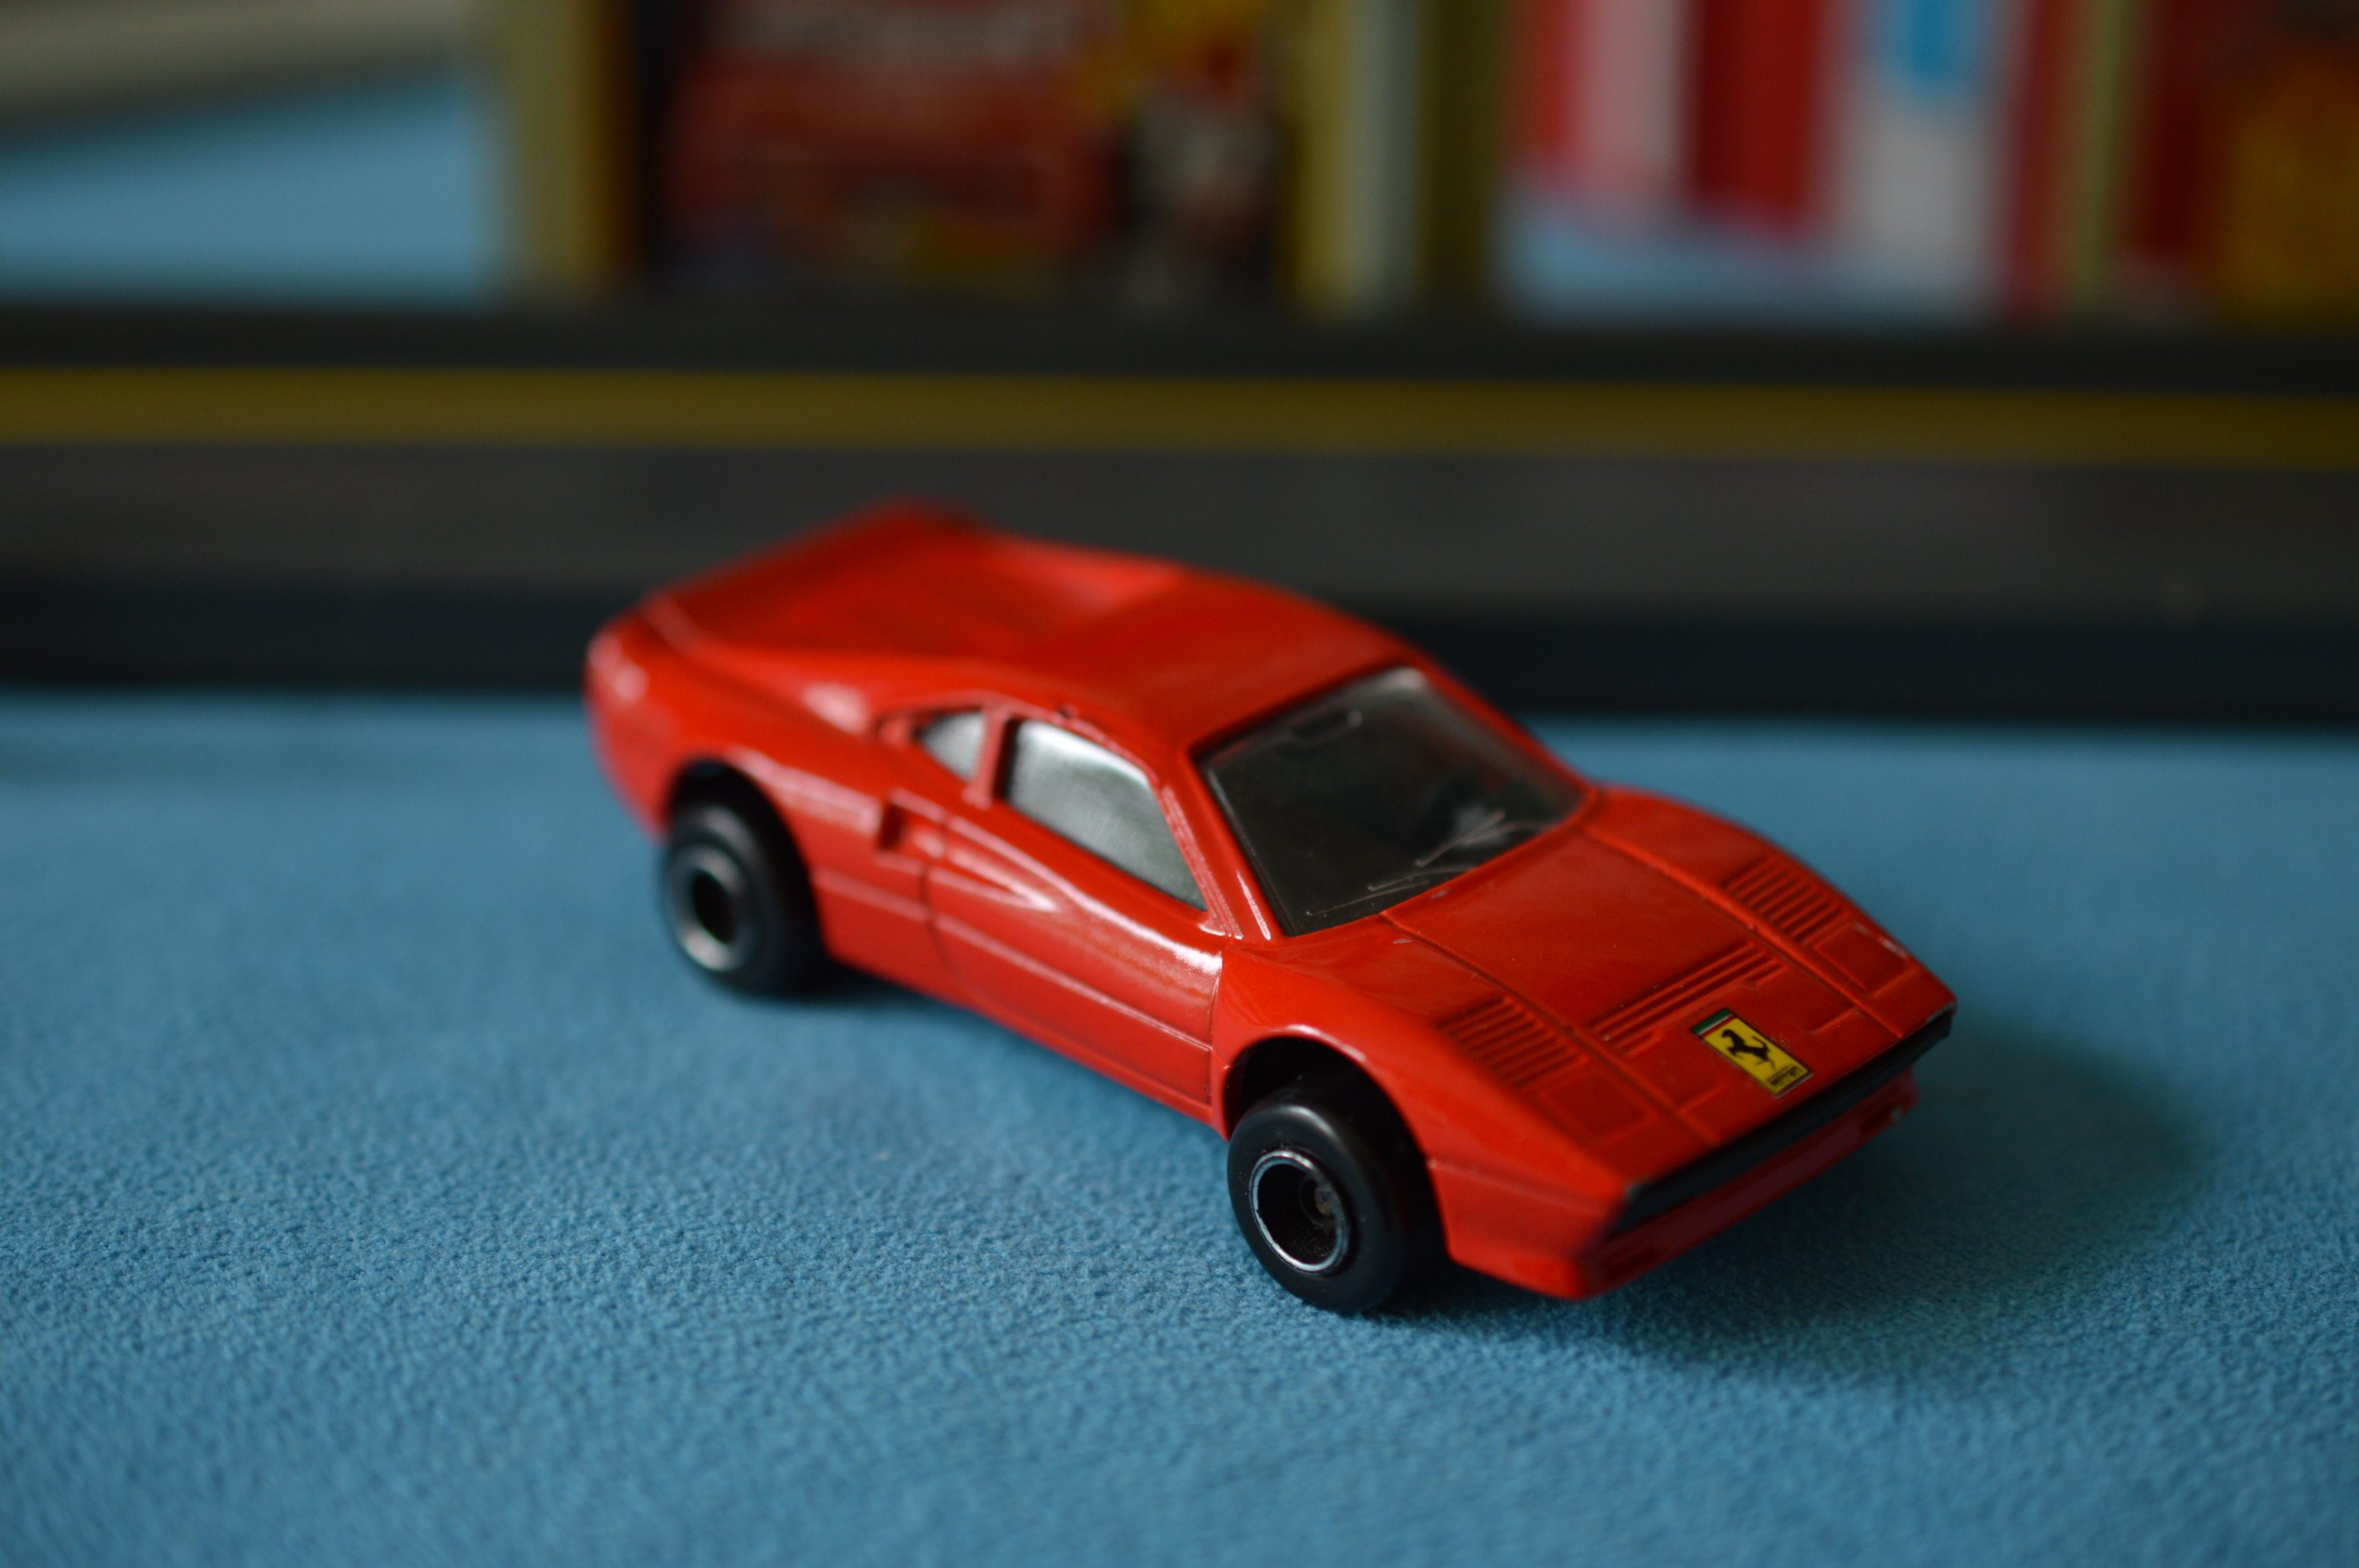 Matchbox Cars Old Vs New Nostalgia Nerd